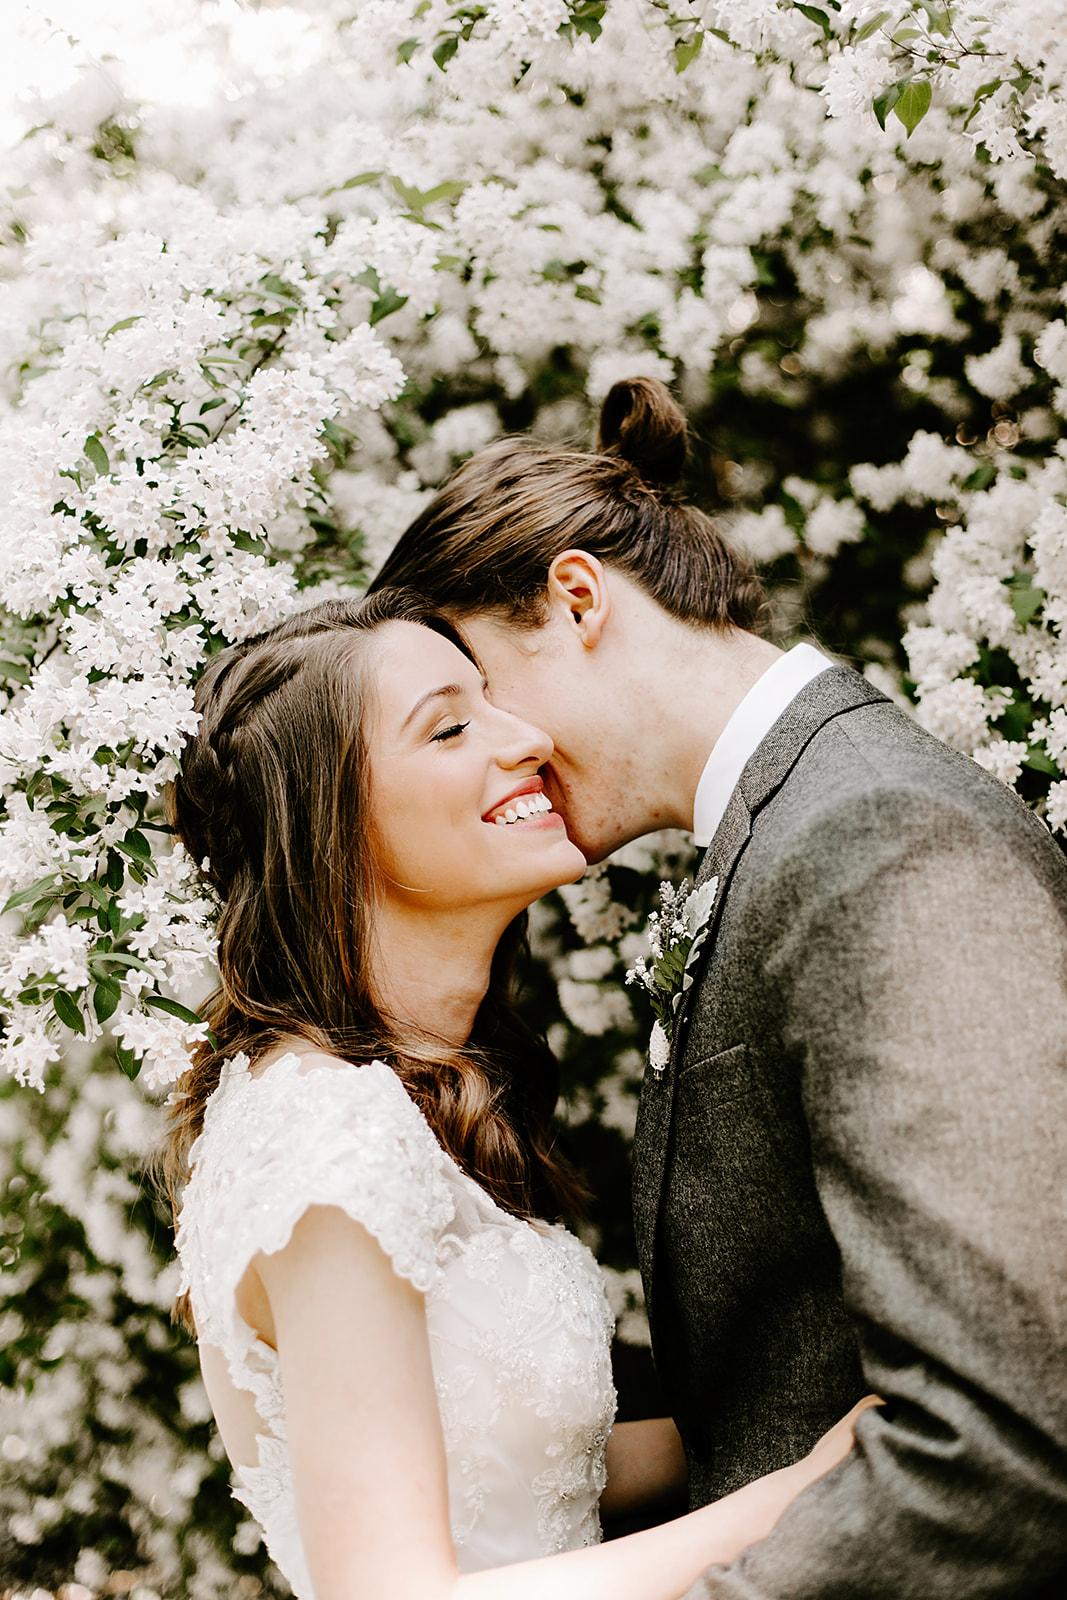 Lily and Easton Wedding Carmel Indiana Cool Creek Park Grace Church Emily Elyse Wehner Photography -227.jpg